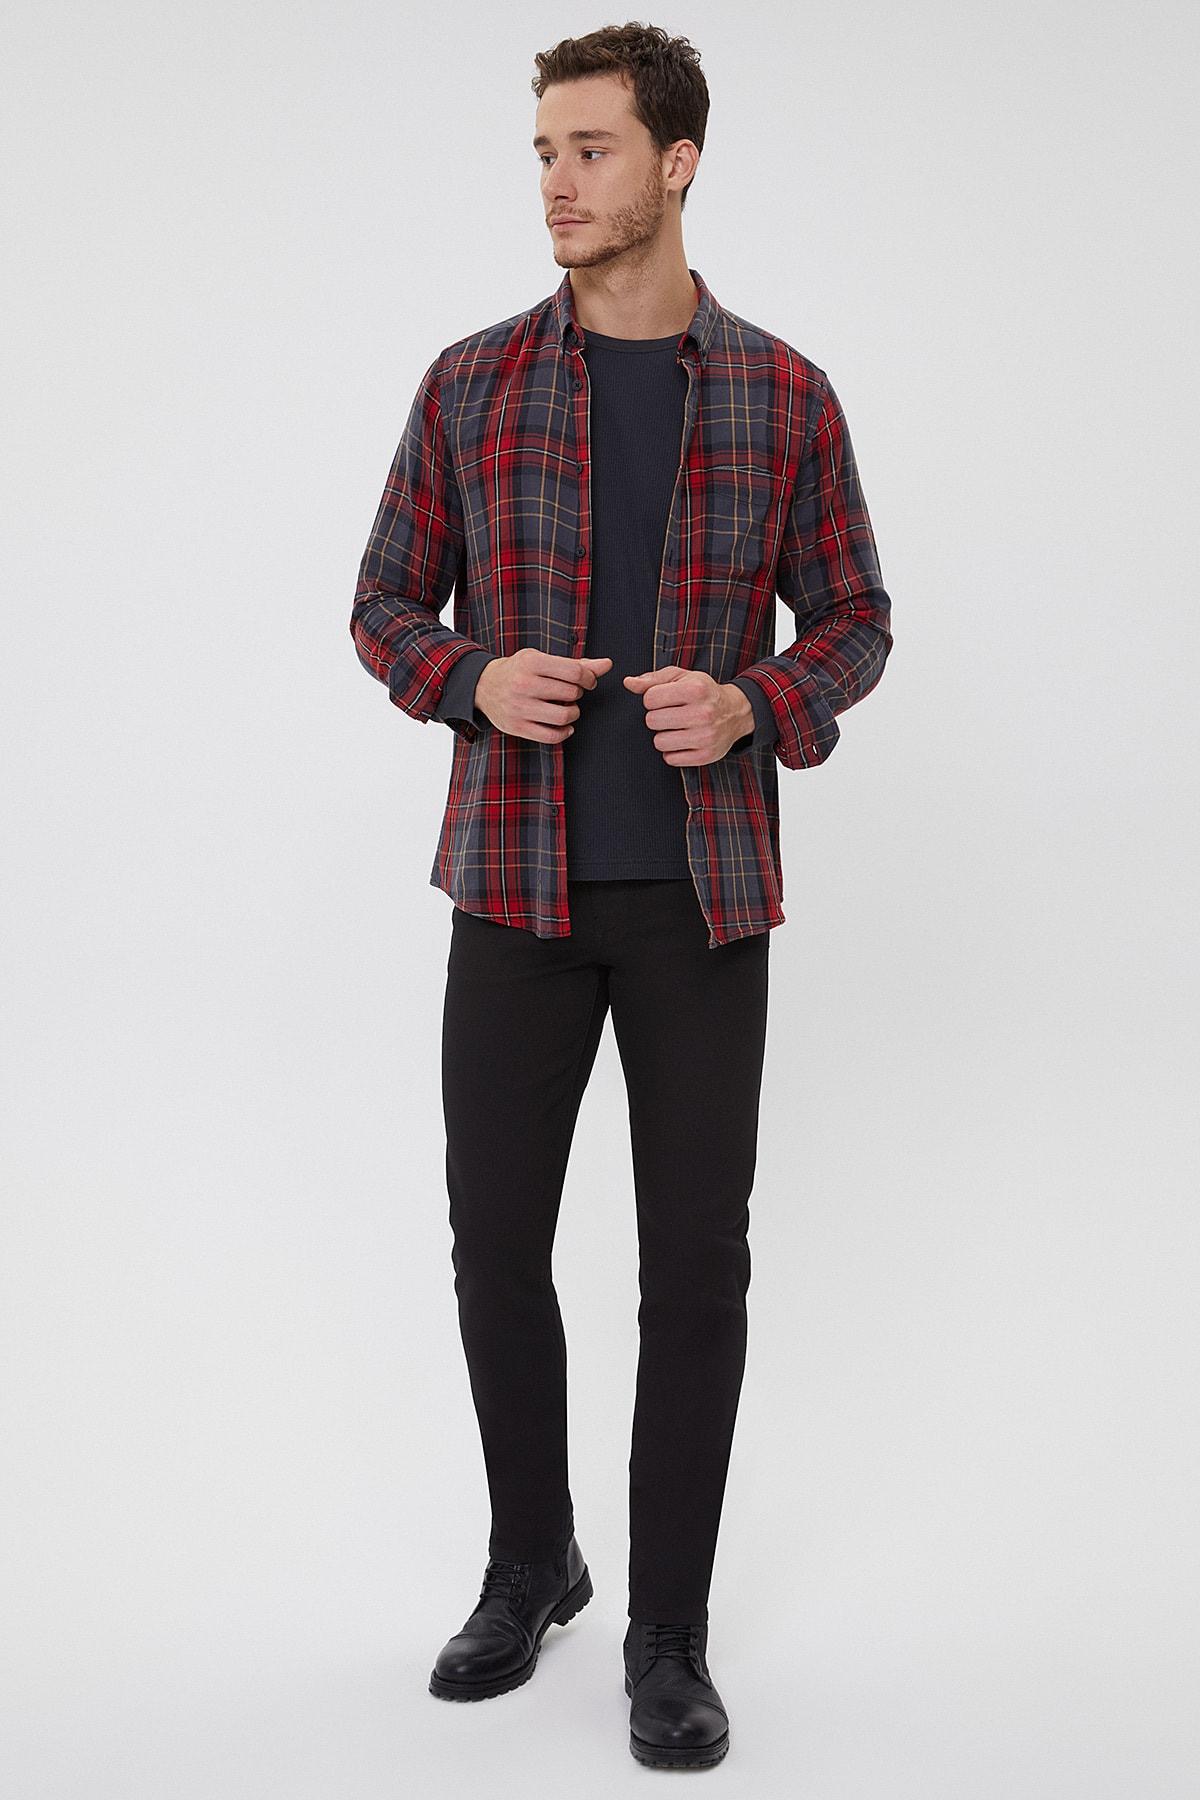 Slim Fit Pamuklu Jagger Jeans Erkek Kot Pantolon 211 Lcm 121032 Dn0199